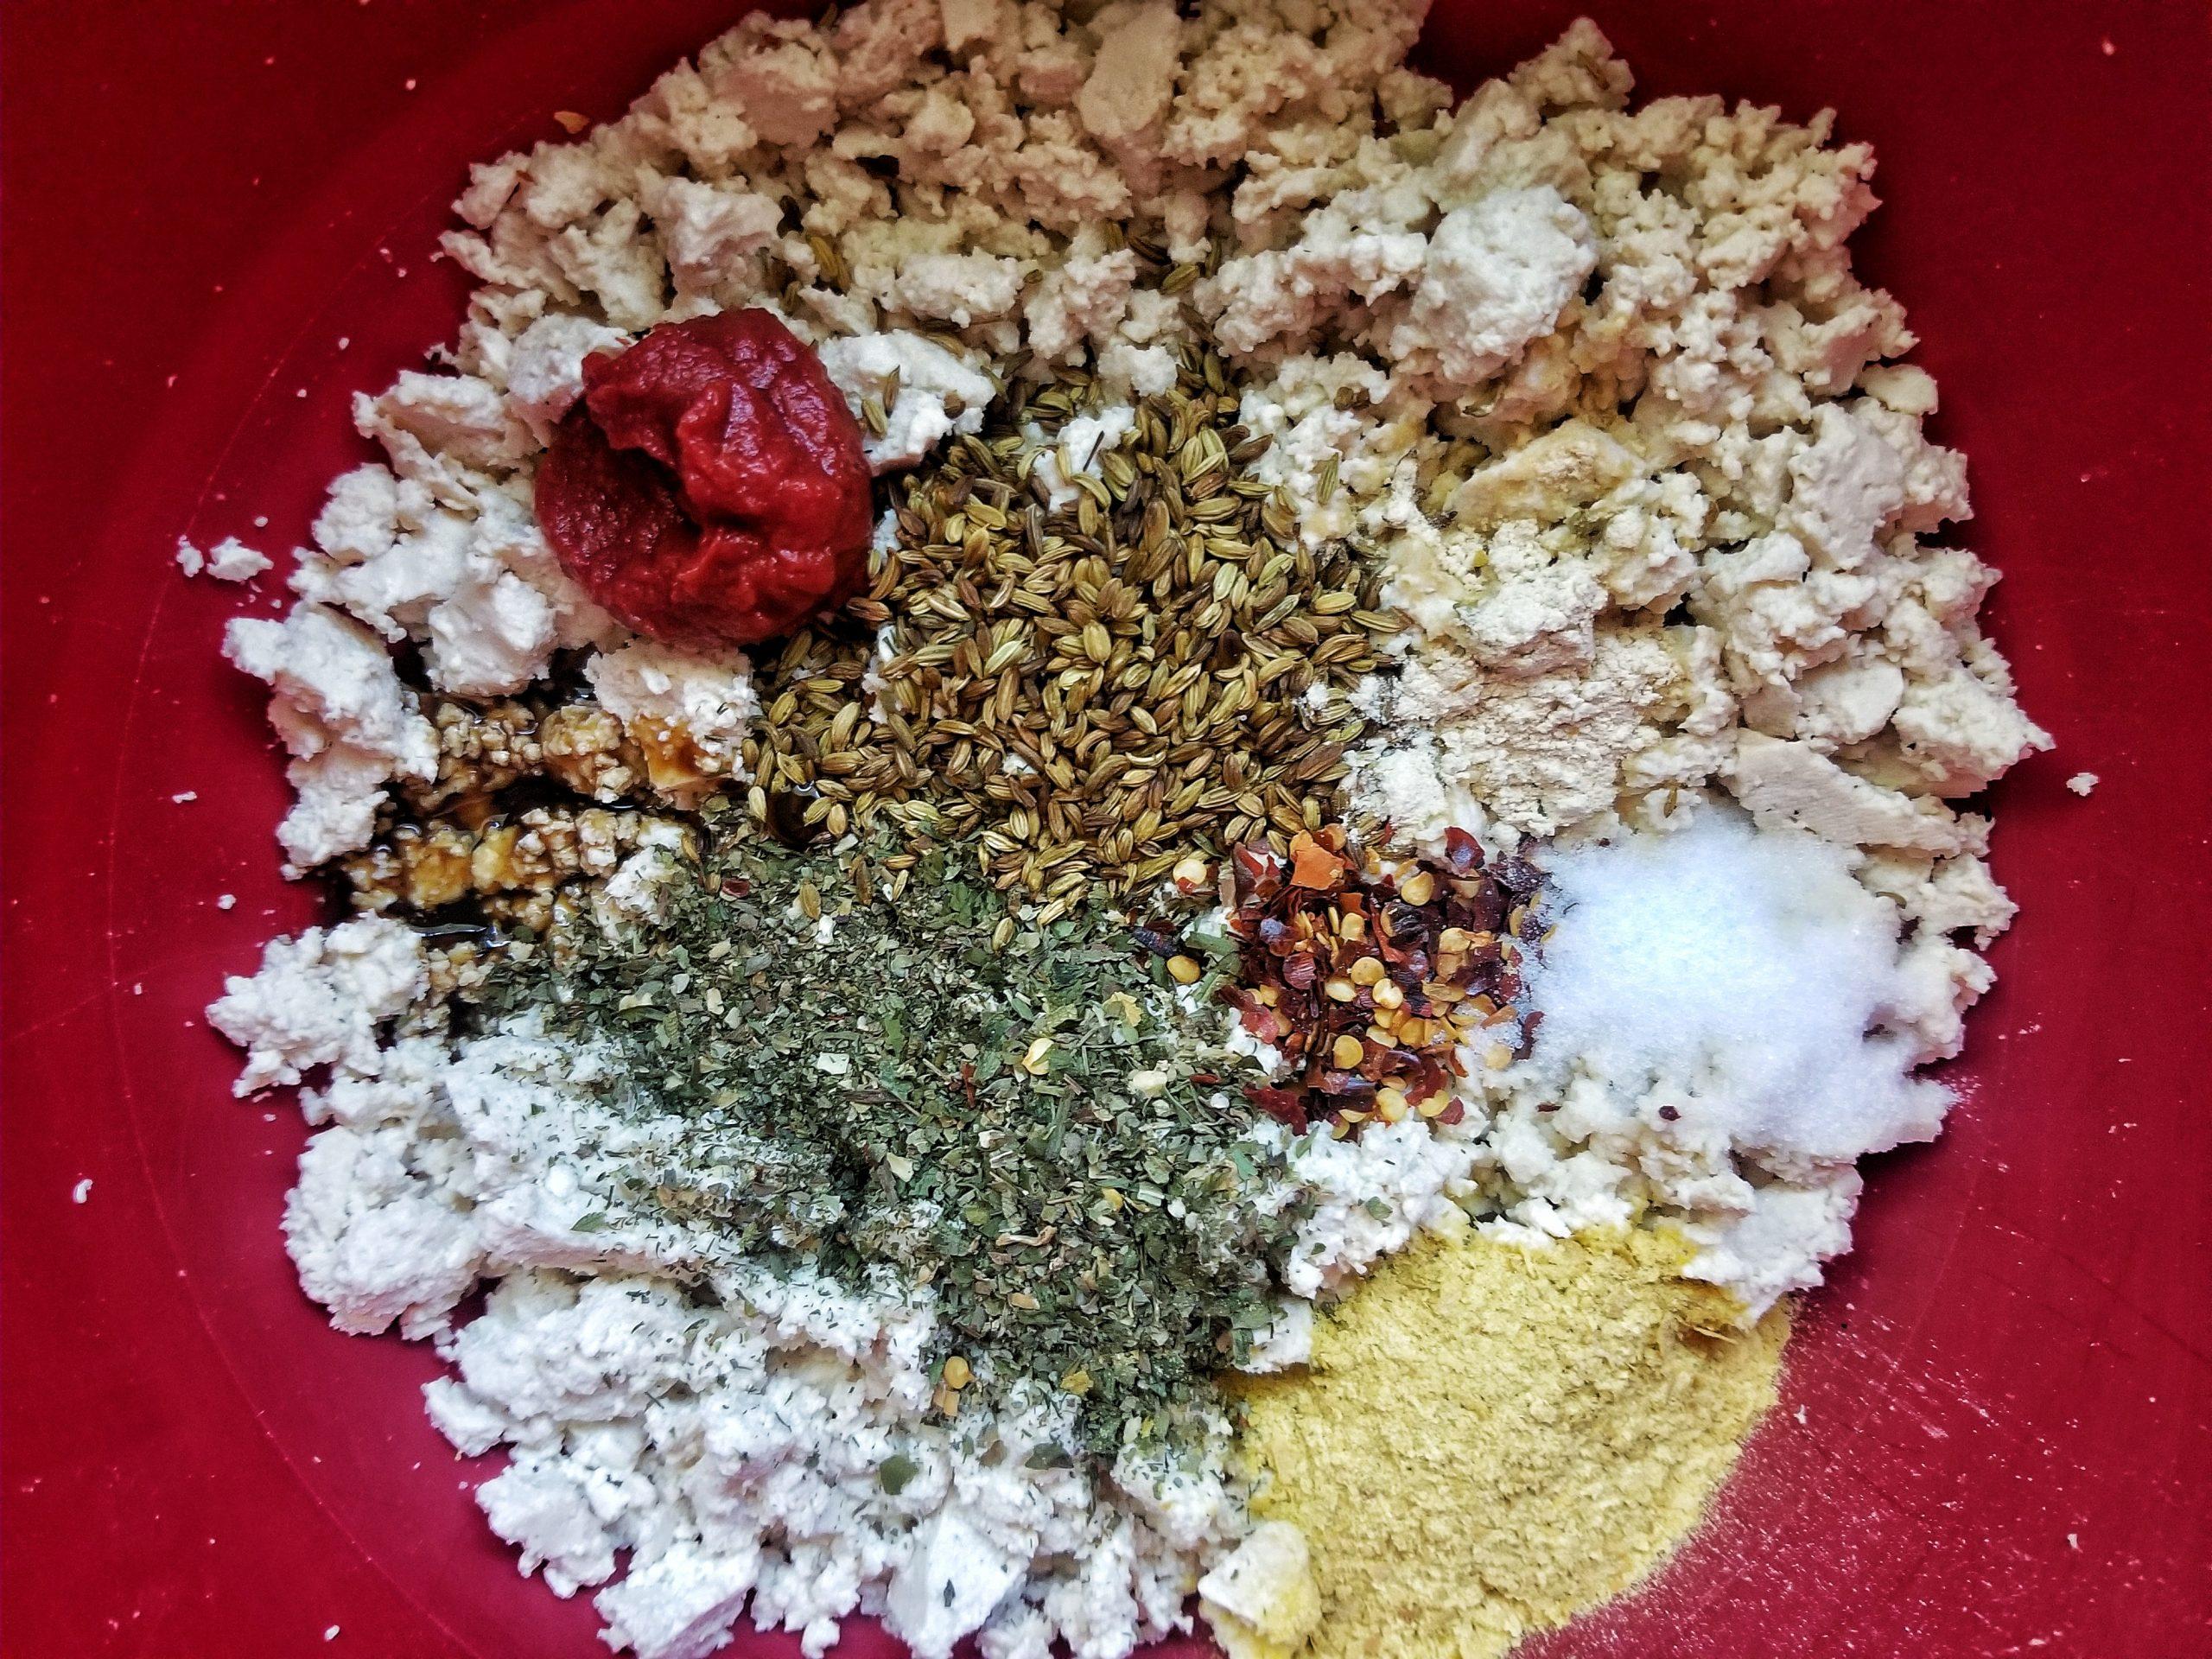 Crumbled tofu with seasonings